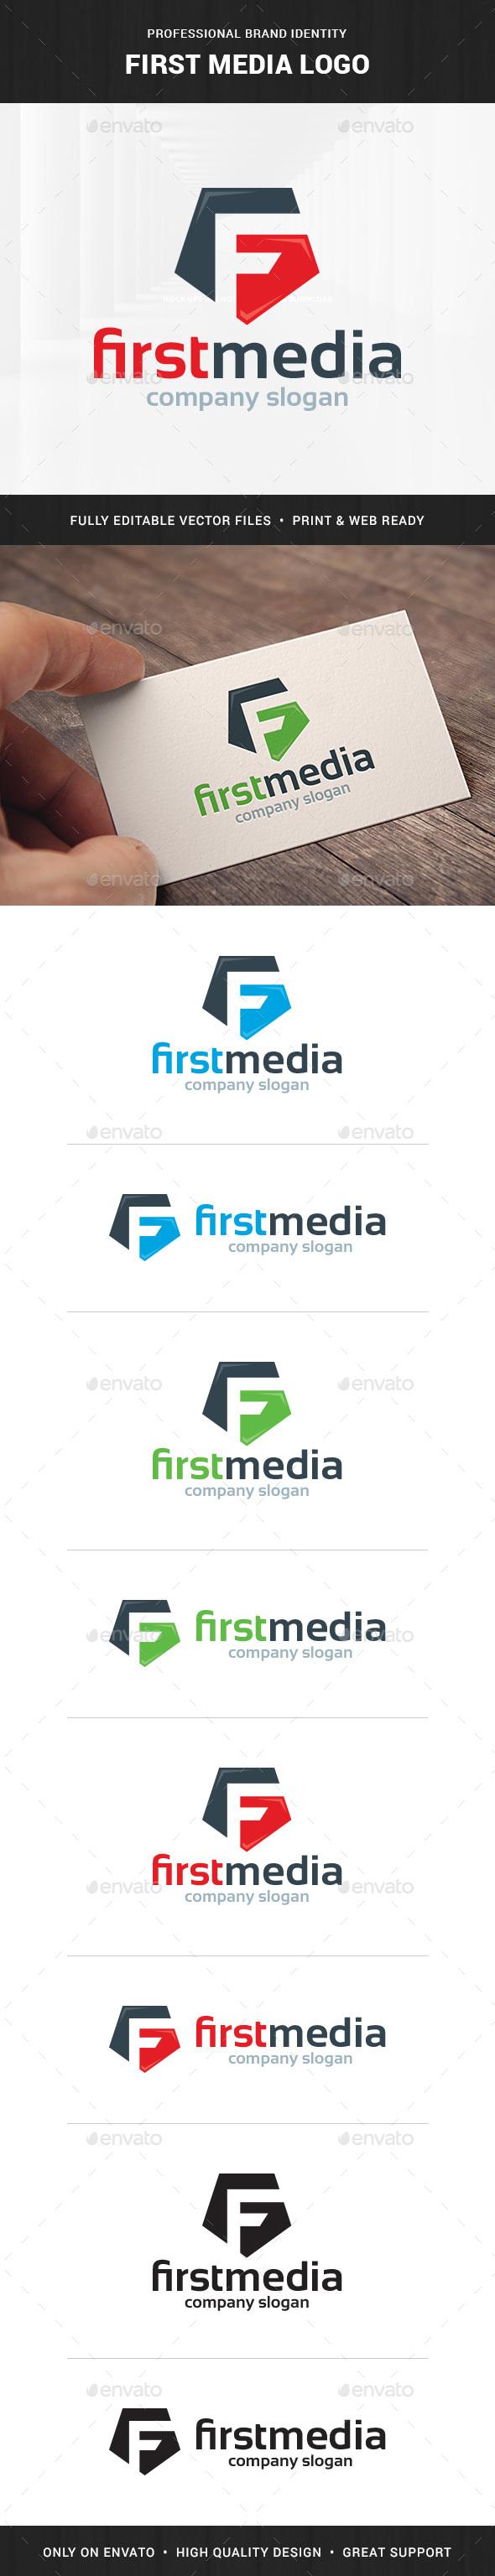 First Media - Letter F Logo